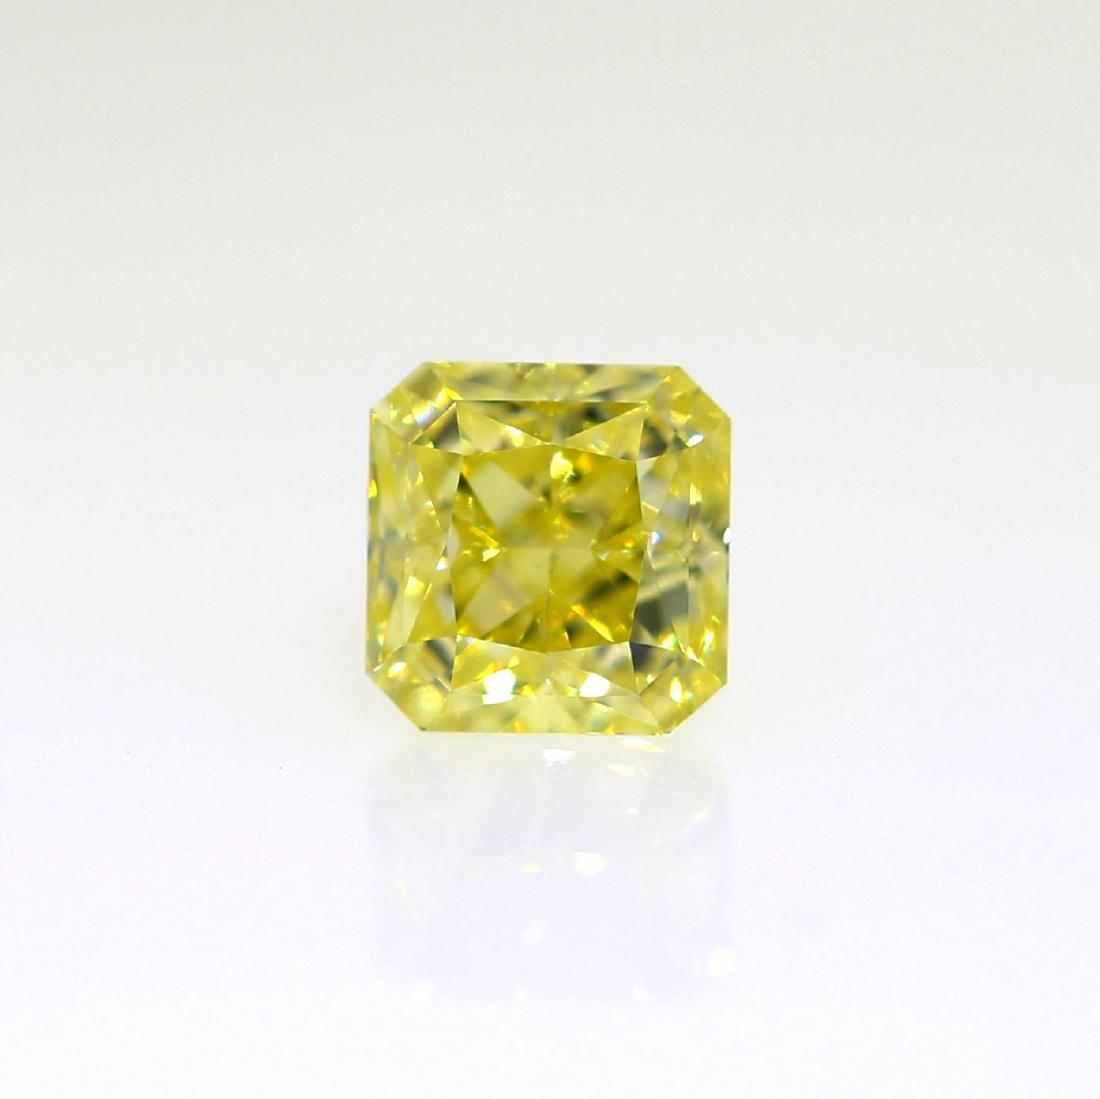 Natural Fancy Yellow 0.73 ct Radiant VS2 Diamond, GIA - 2